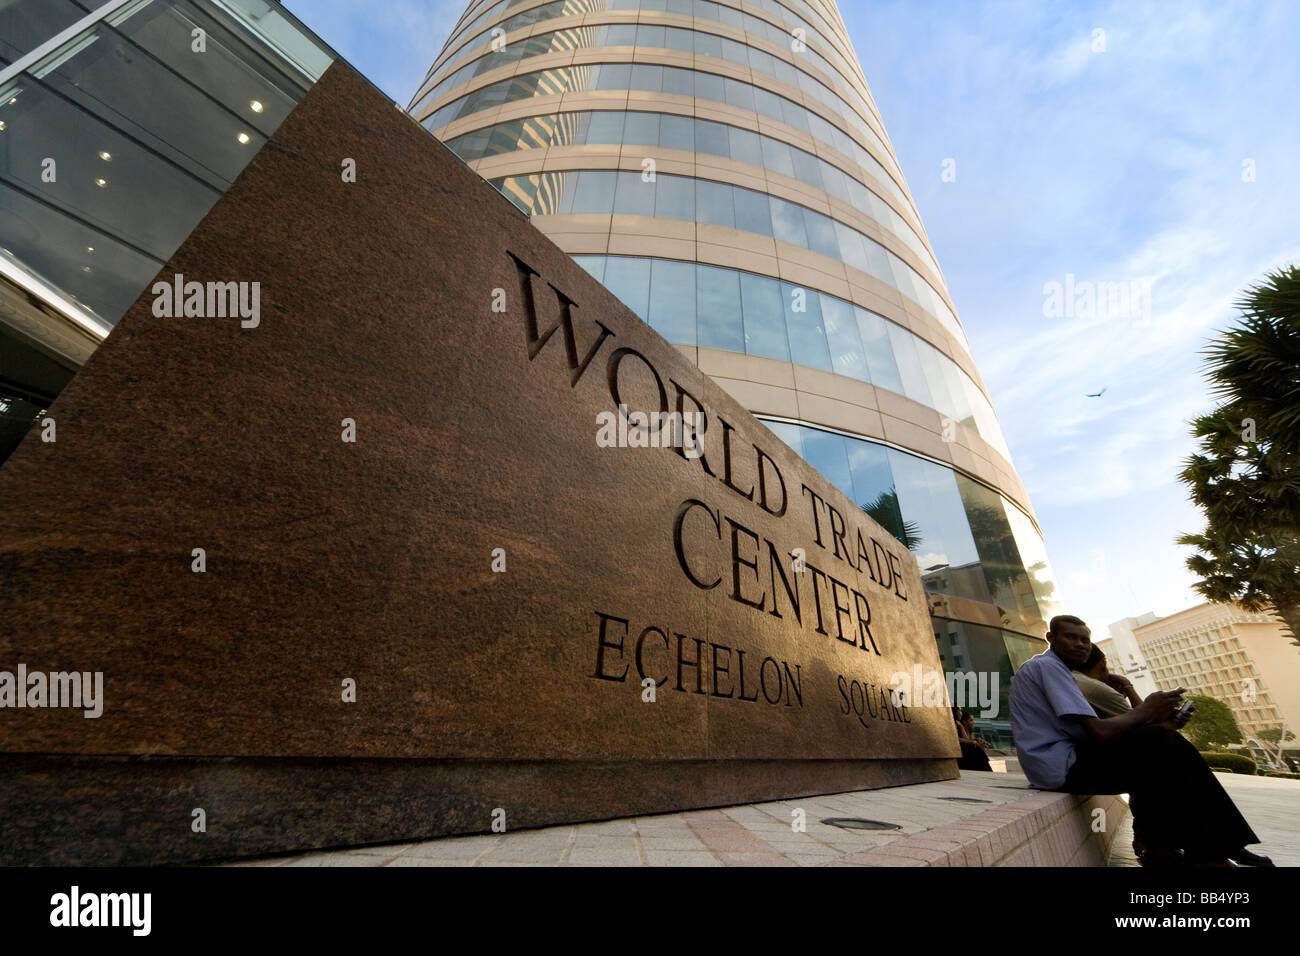 Main entrance of the WTC World Trade Center, Centre, Colombo Sri Lanka - Stock Image